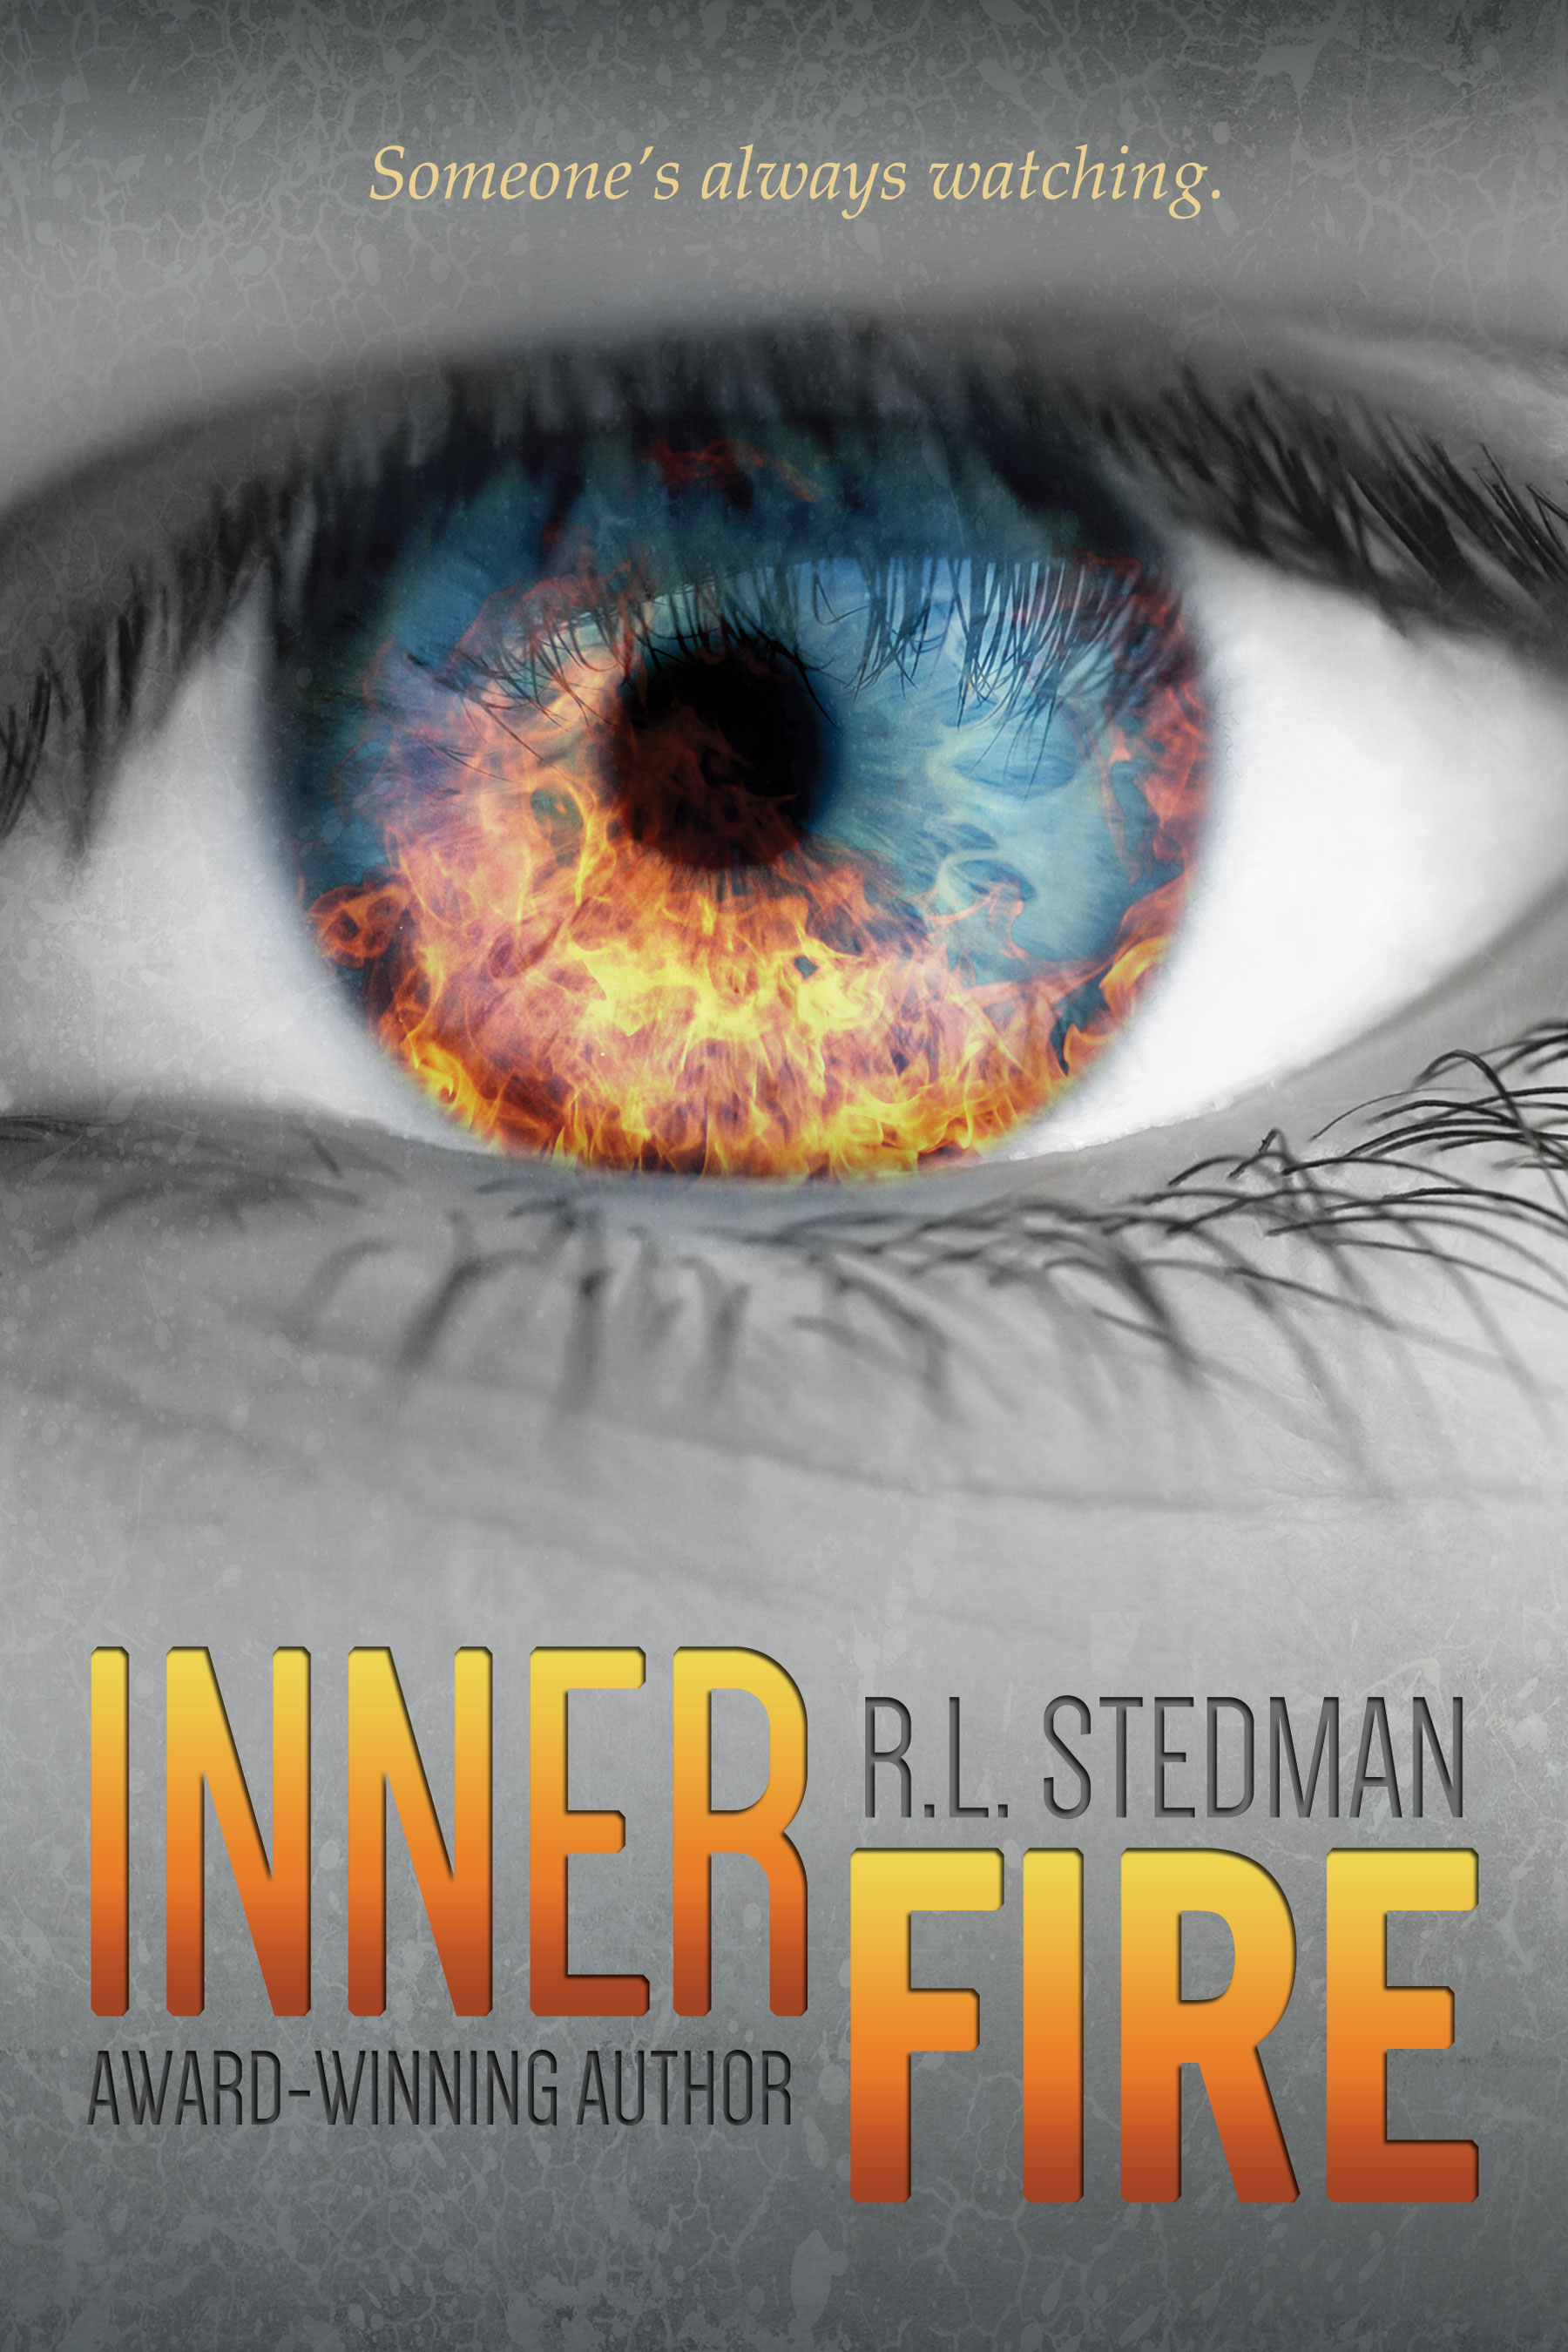 Inner Fire, a YA novel by RL Stedman